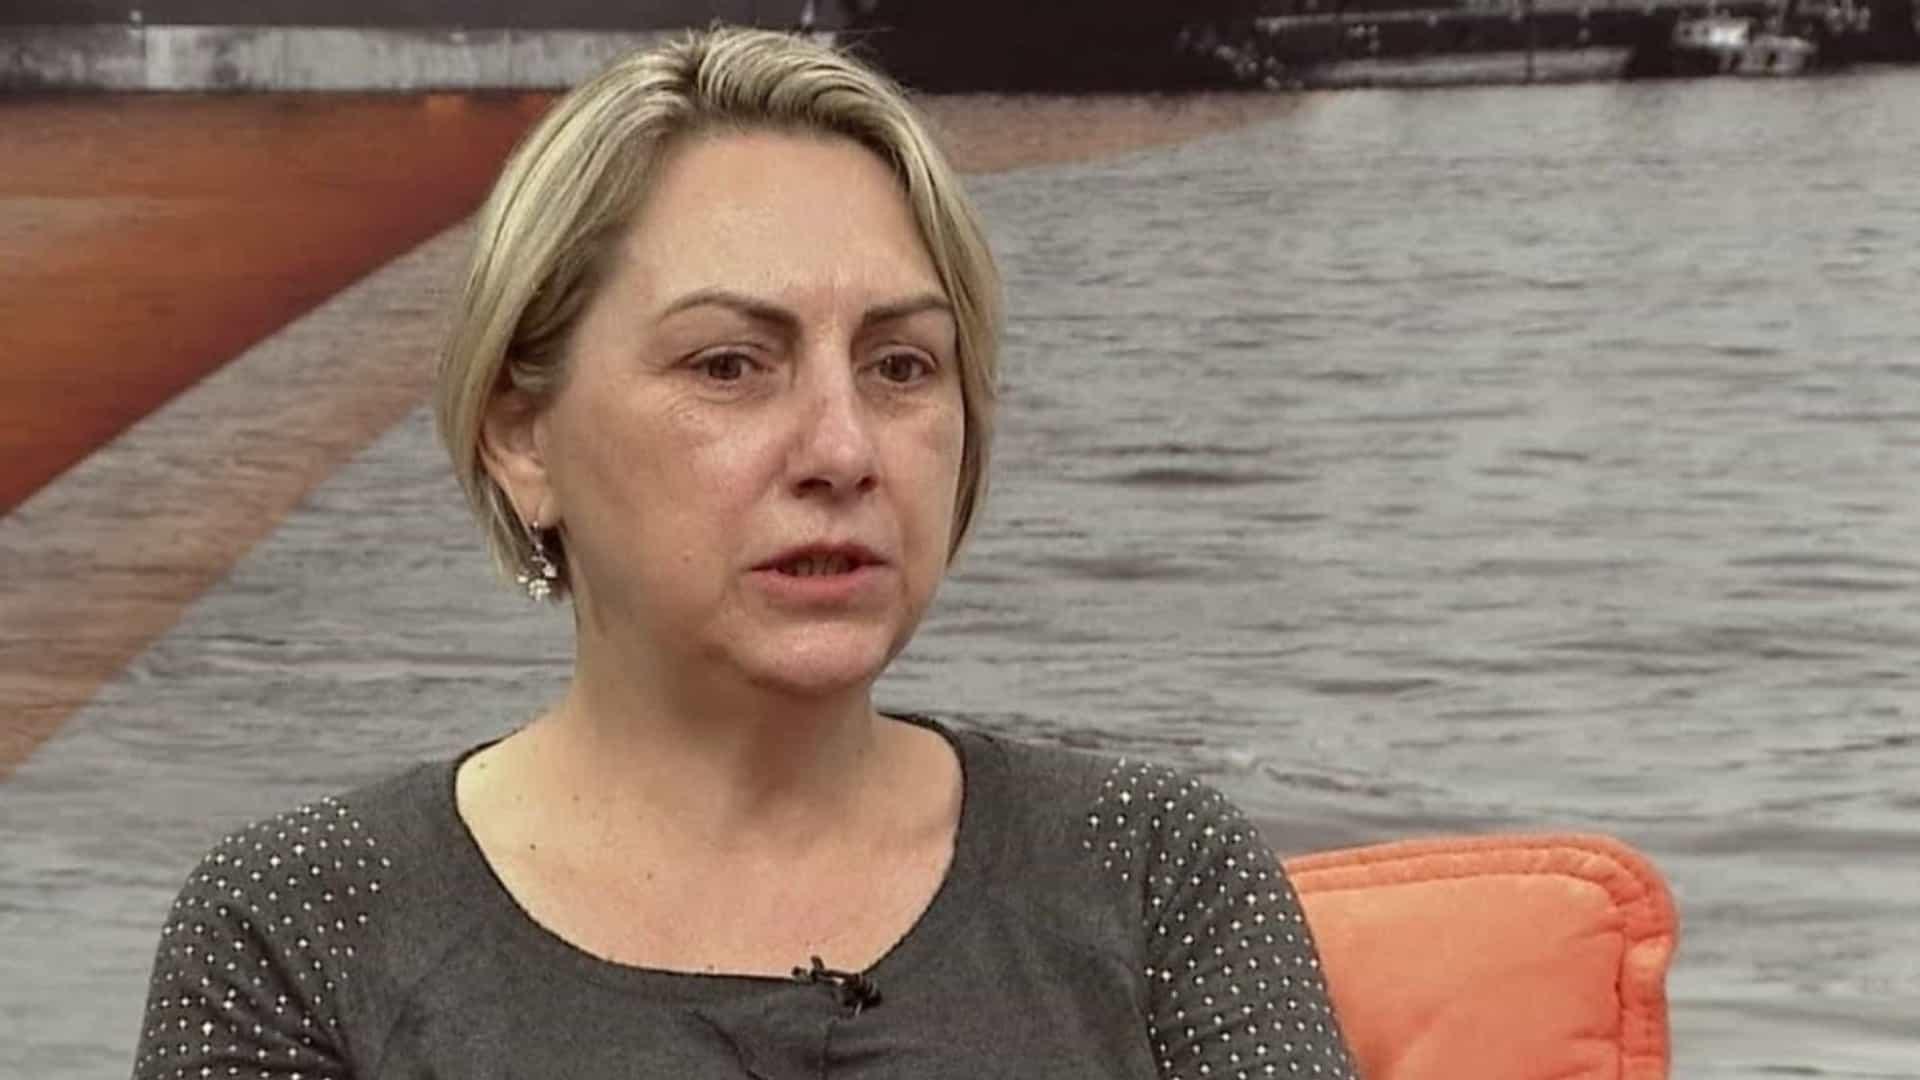 vania bolsonaro - Irmã mais nova de Bolsonaro é internada com suspeita de Covid-19